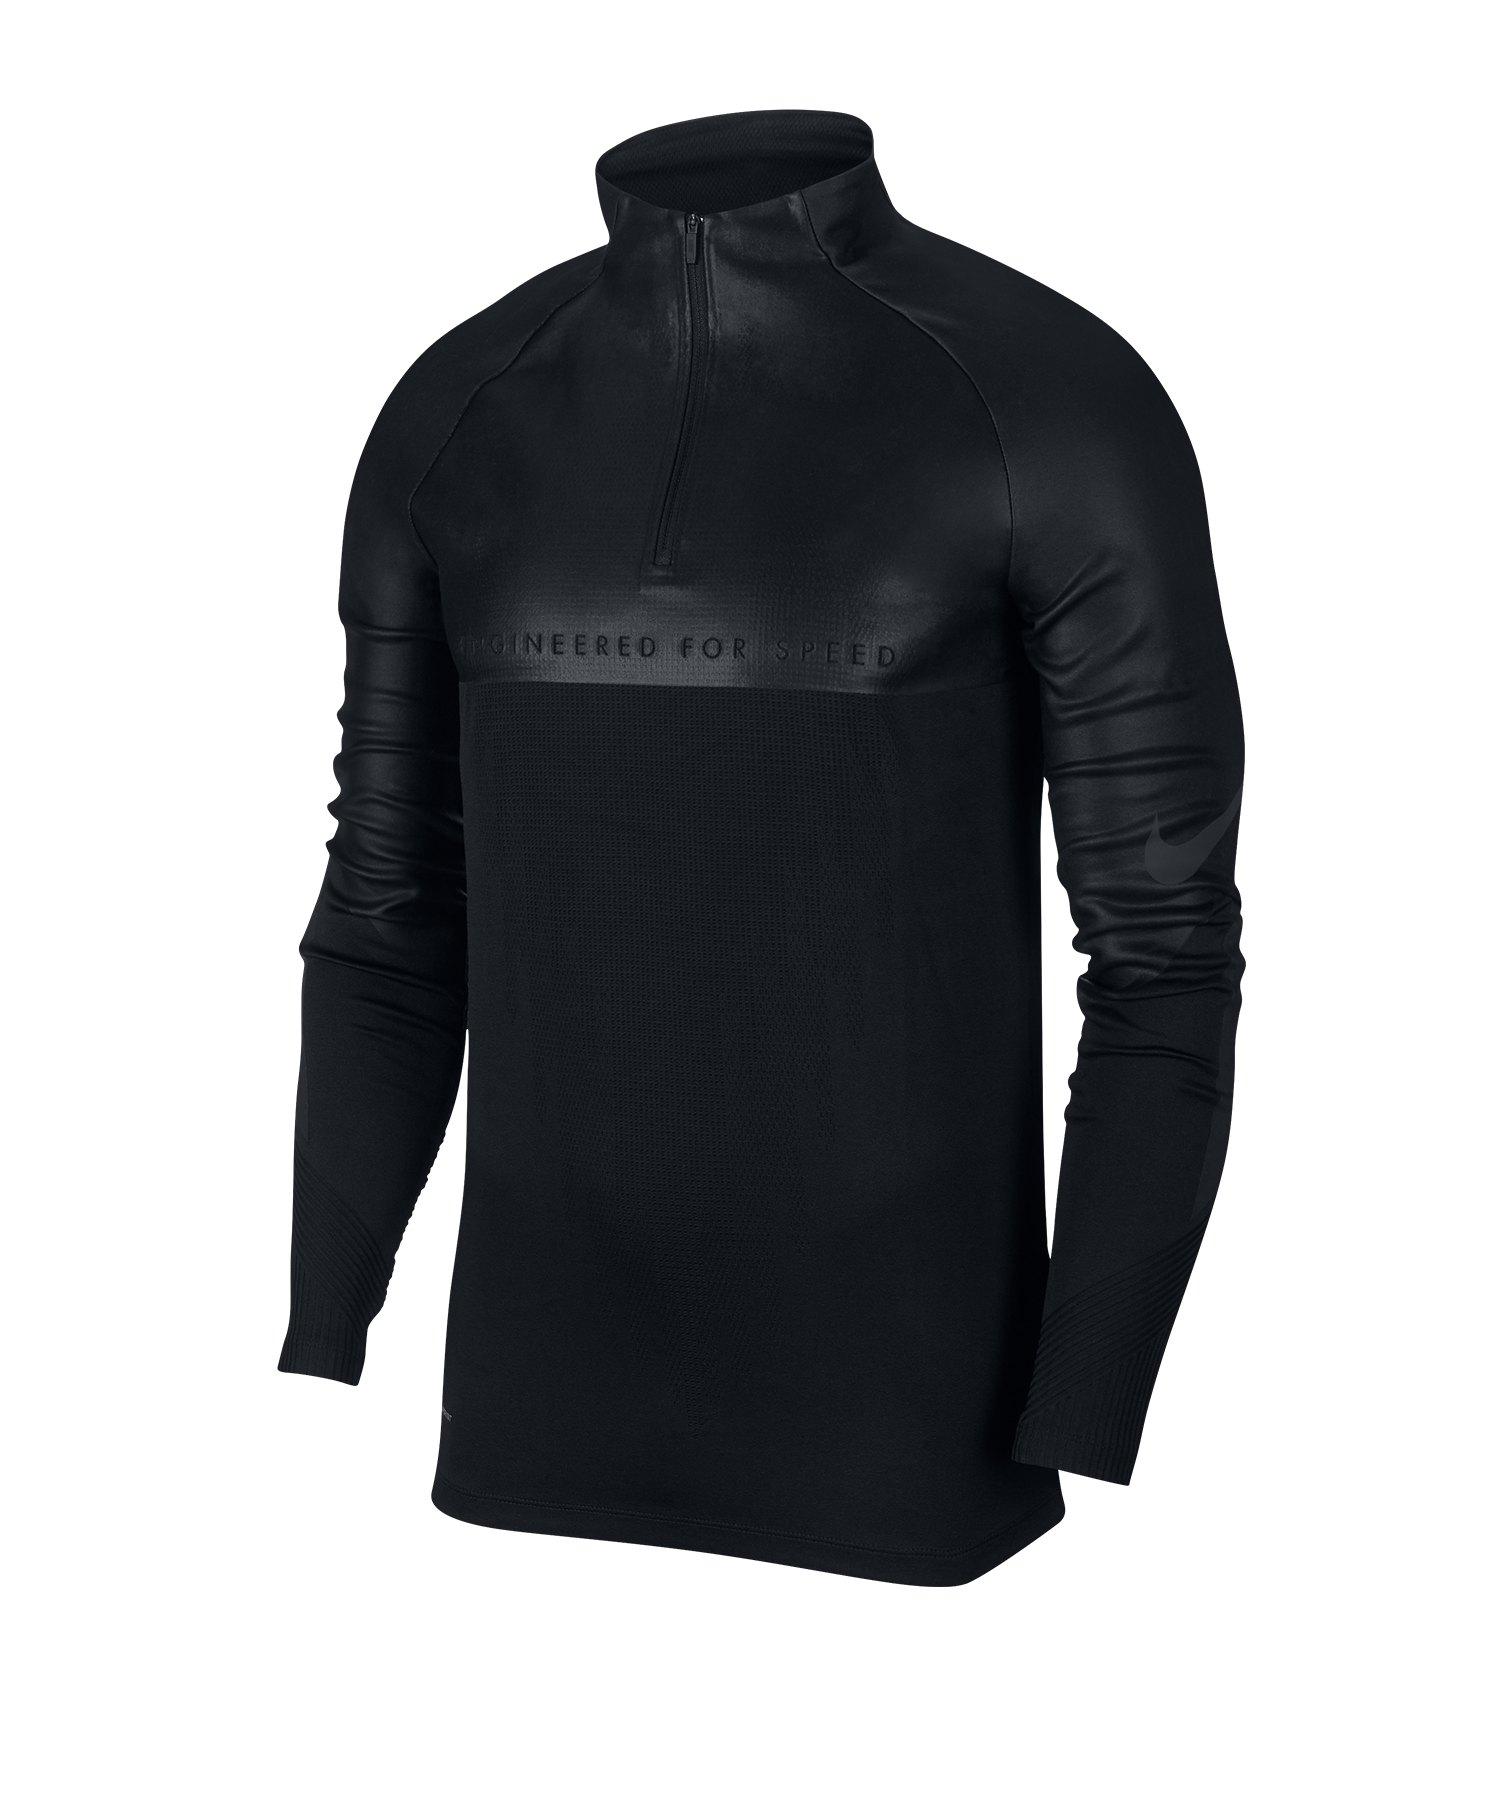 Nike VaporKnit Strike 1/4 Zip Shirt langarm F010 - schwarz